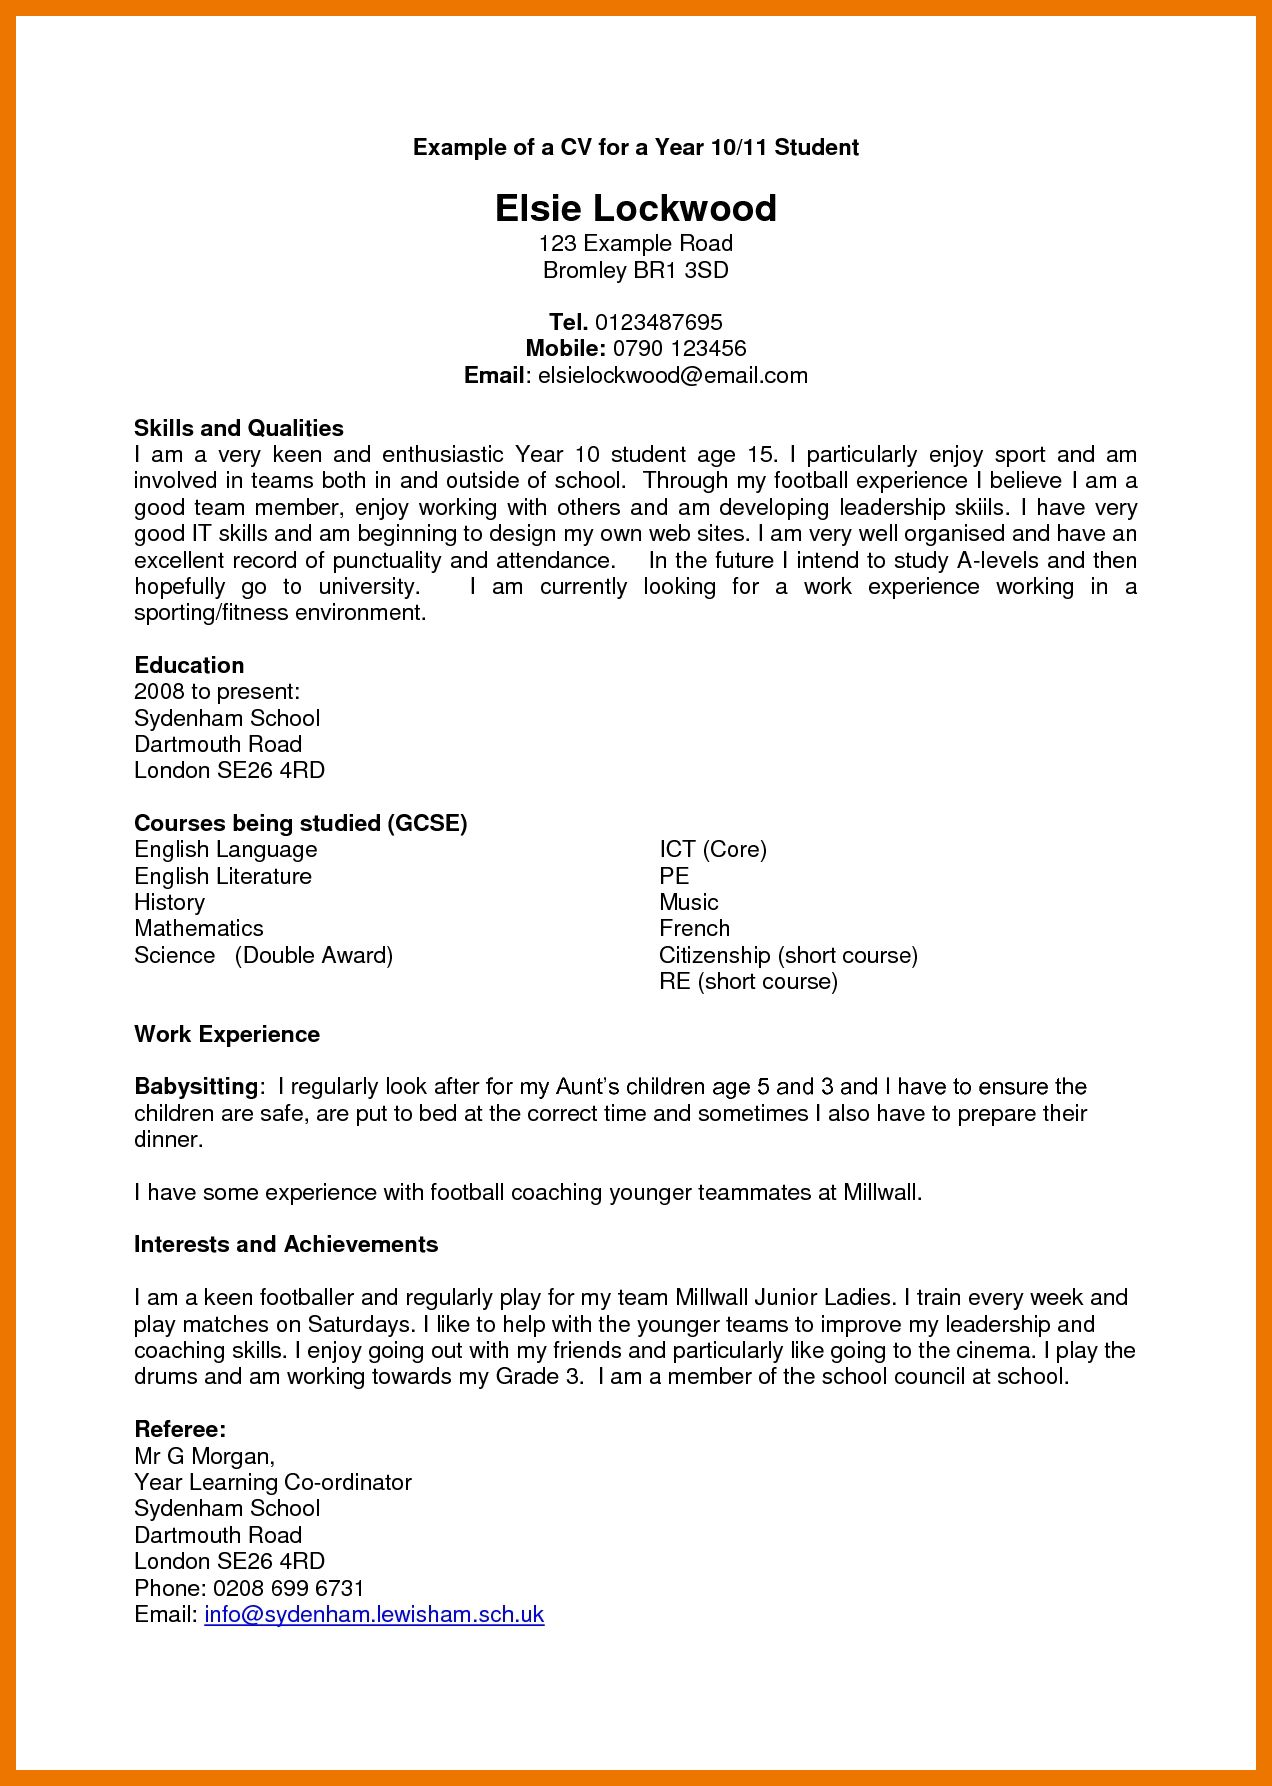 Cv Template Year 11 Cv template, Resume examples, Resume